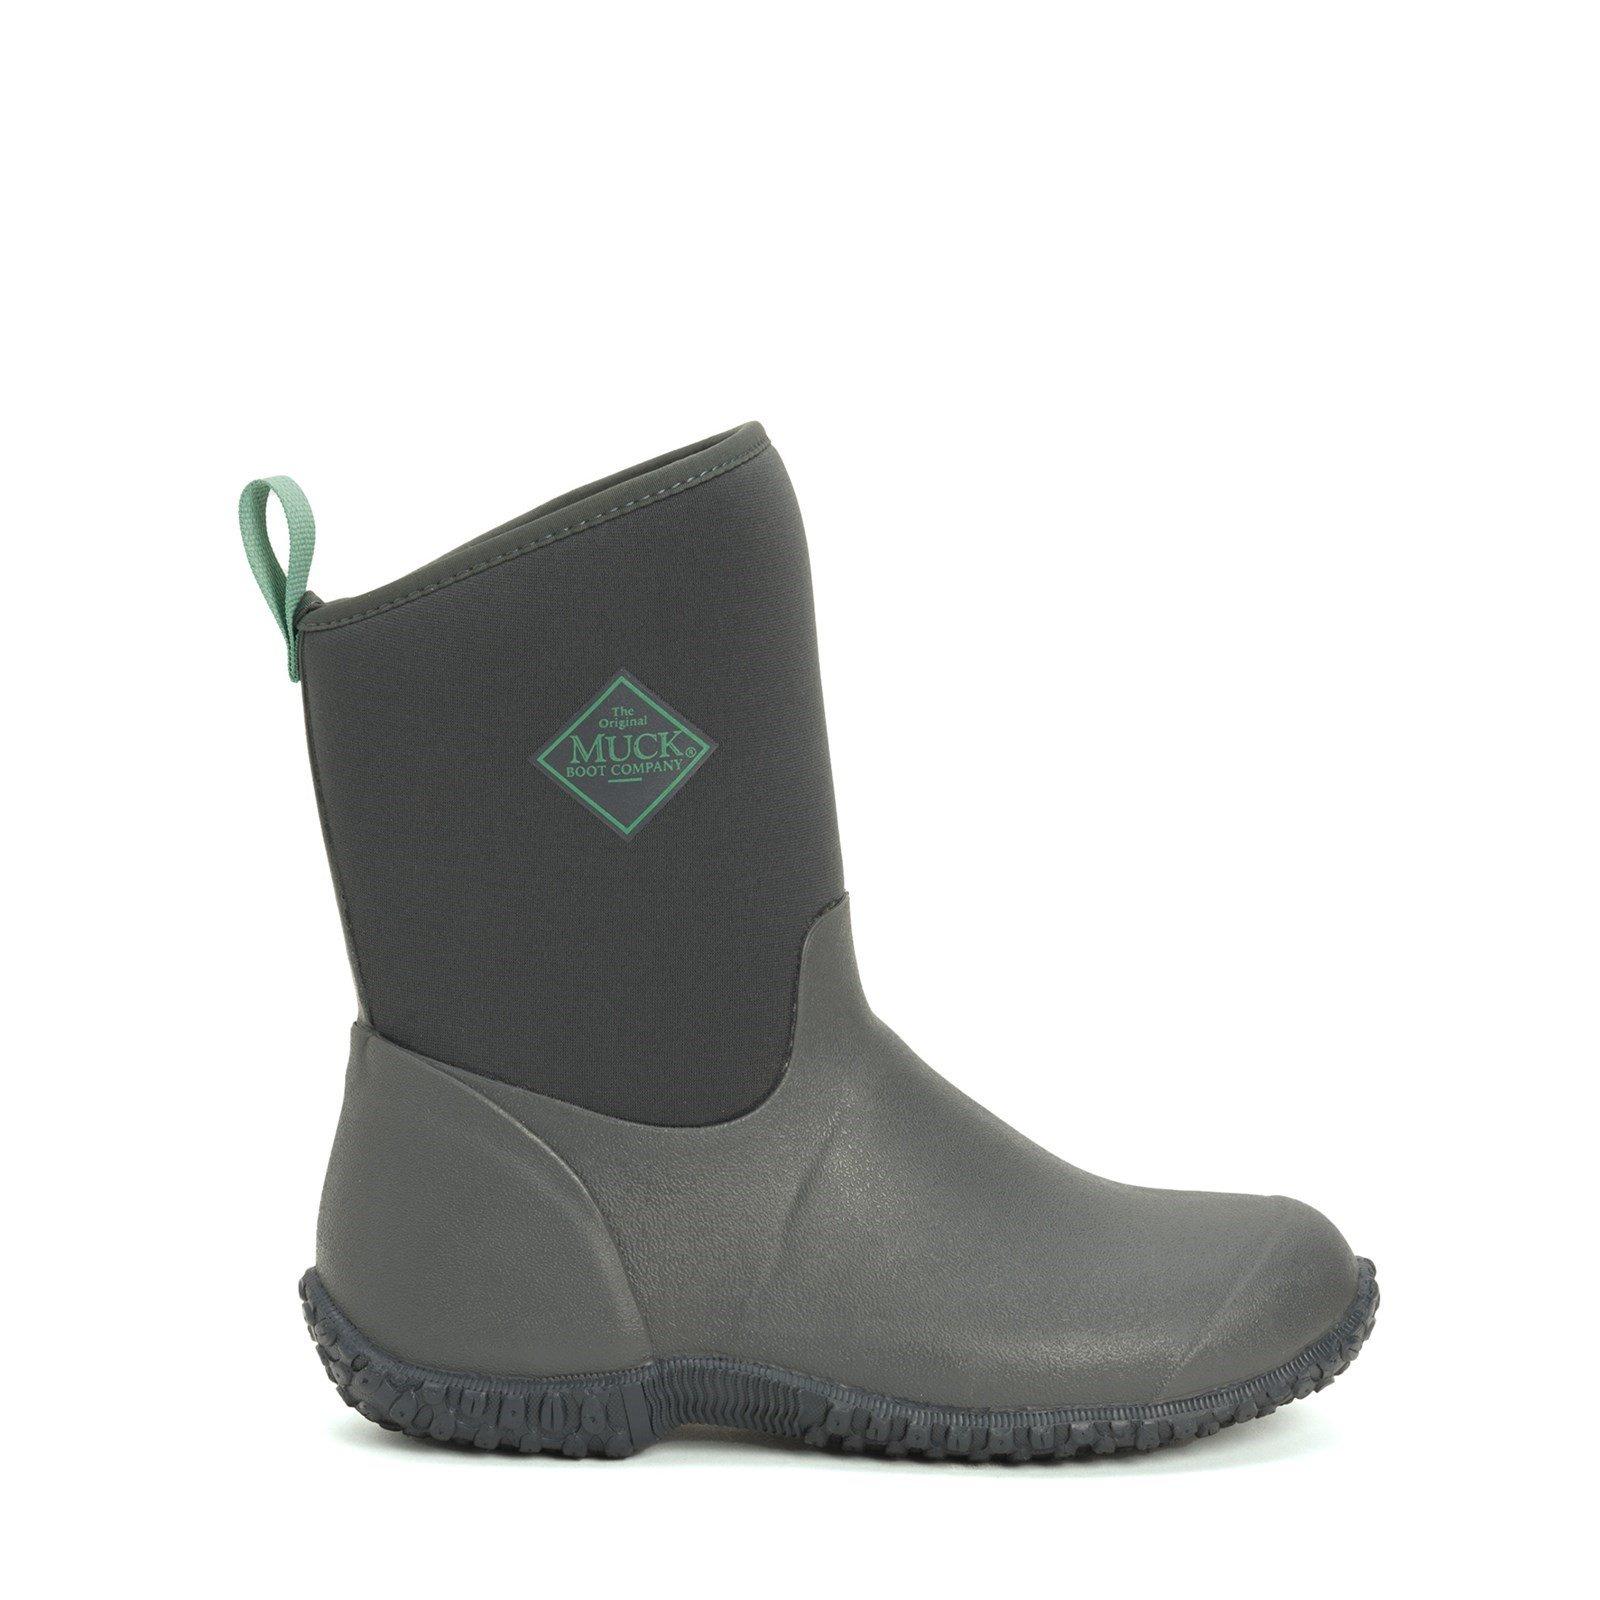 Muck Boots Women's Muckster II Slip On Short Boot Multicolor 28899 - Grey/Print 4